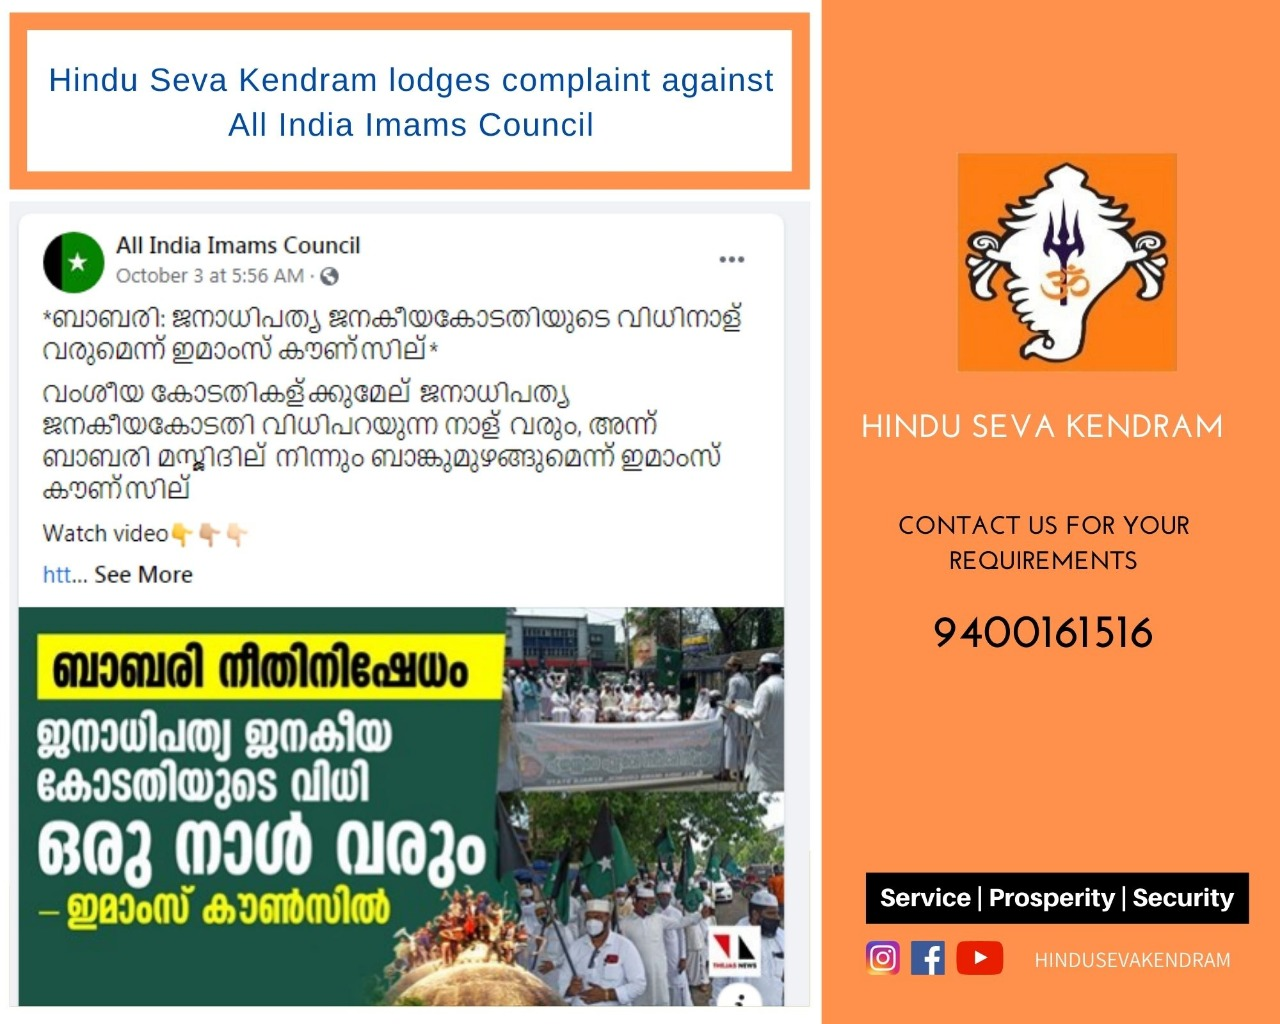 Hindu Seva Kendram has lodges complaint against All India Imams Council